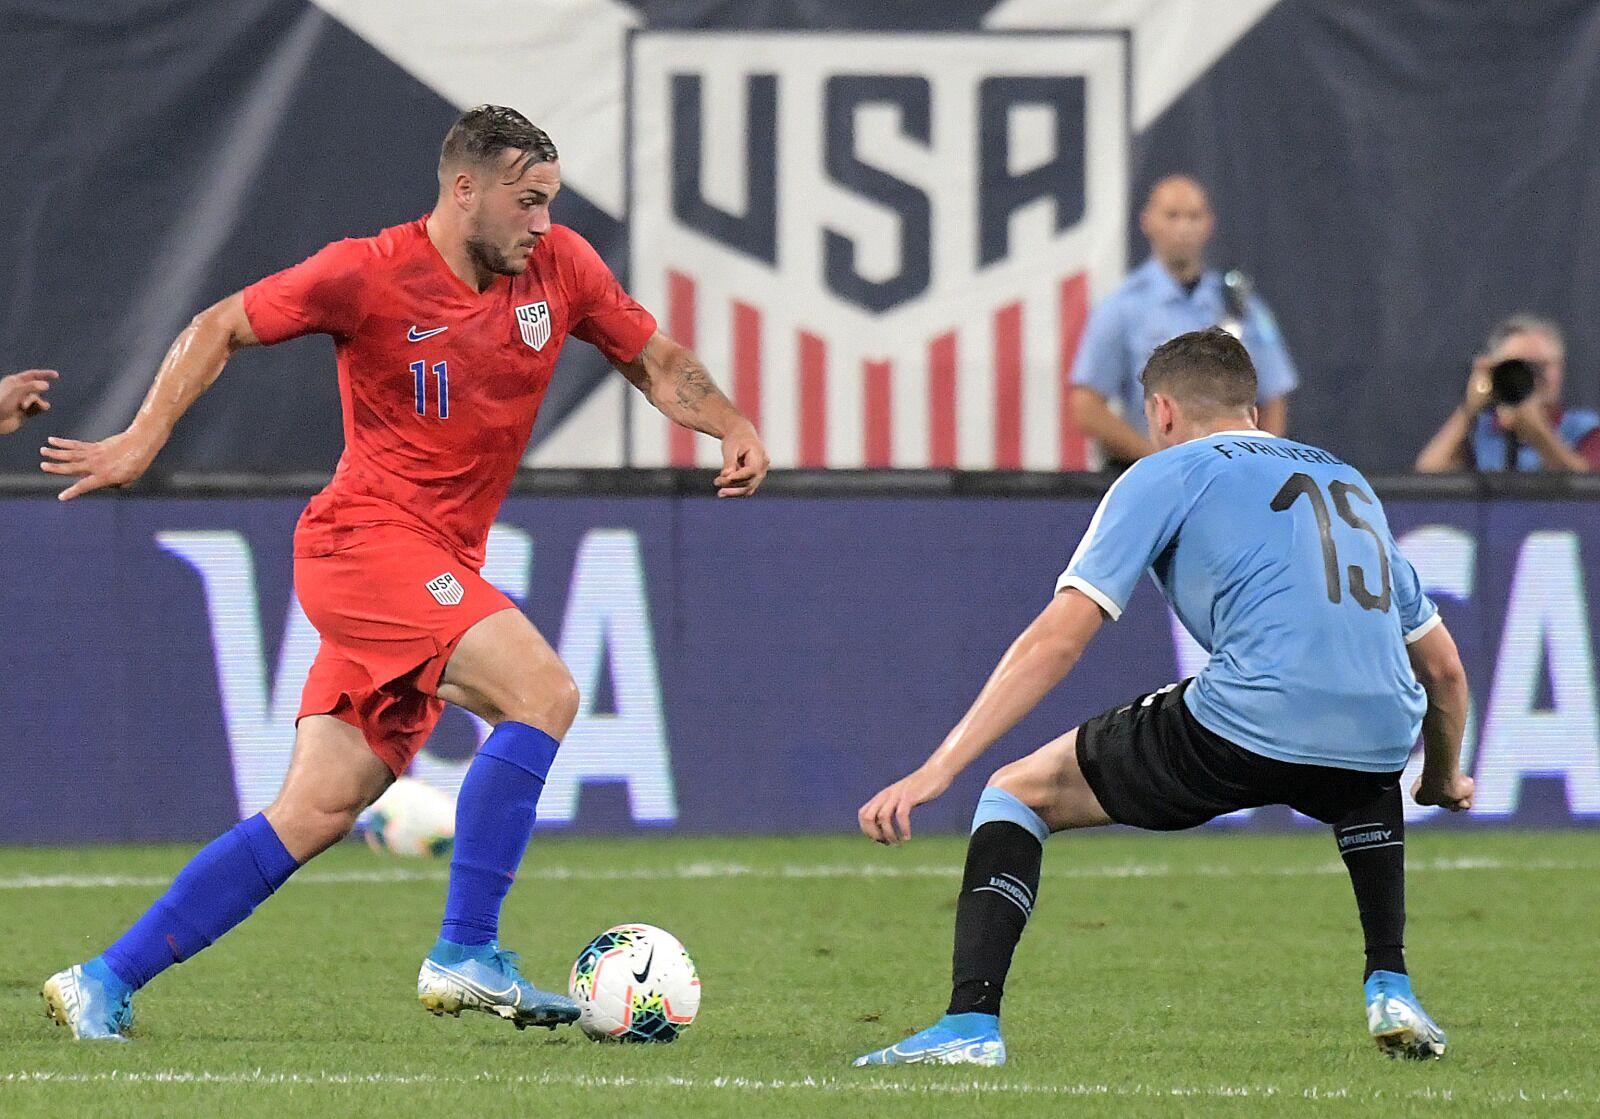 USMNT Vs Uruguay: Jordan Morris stakes his claim